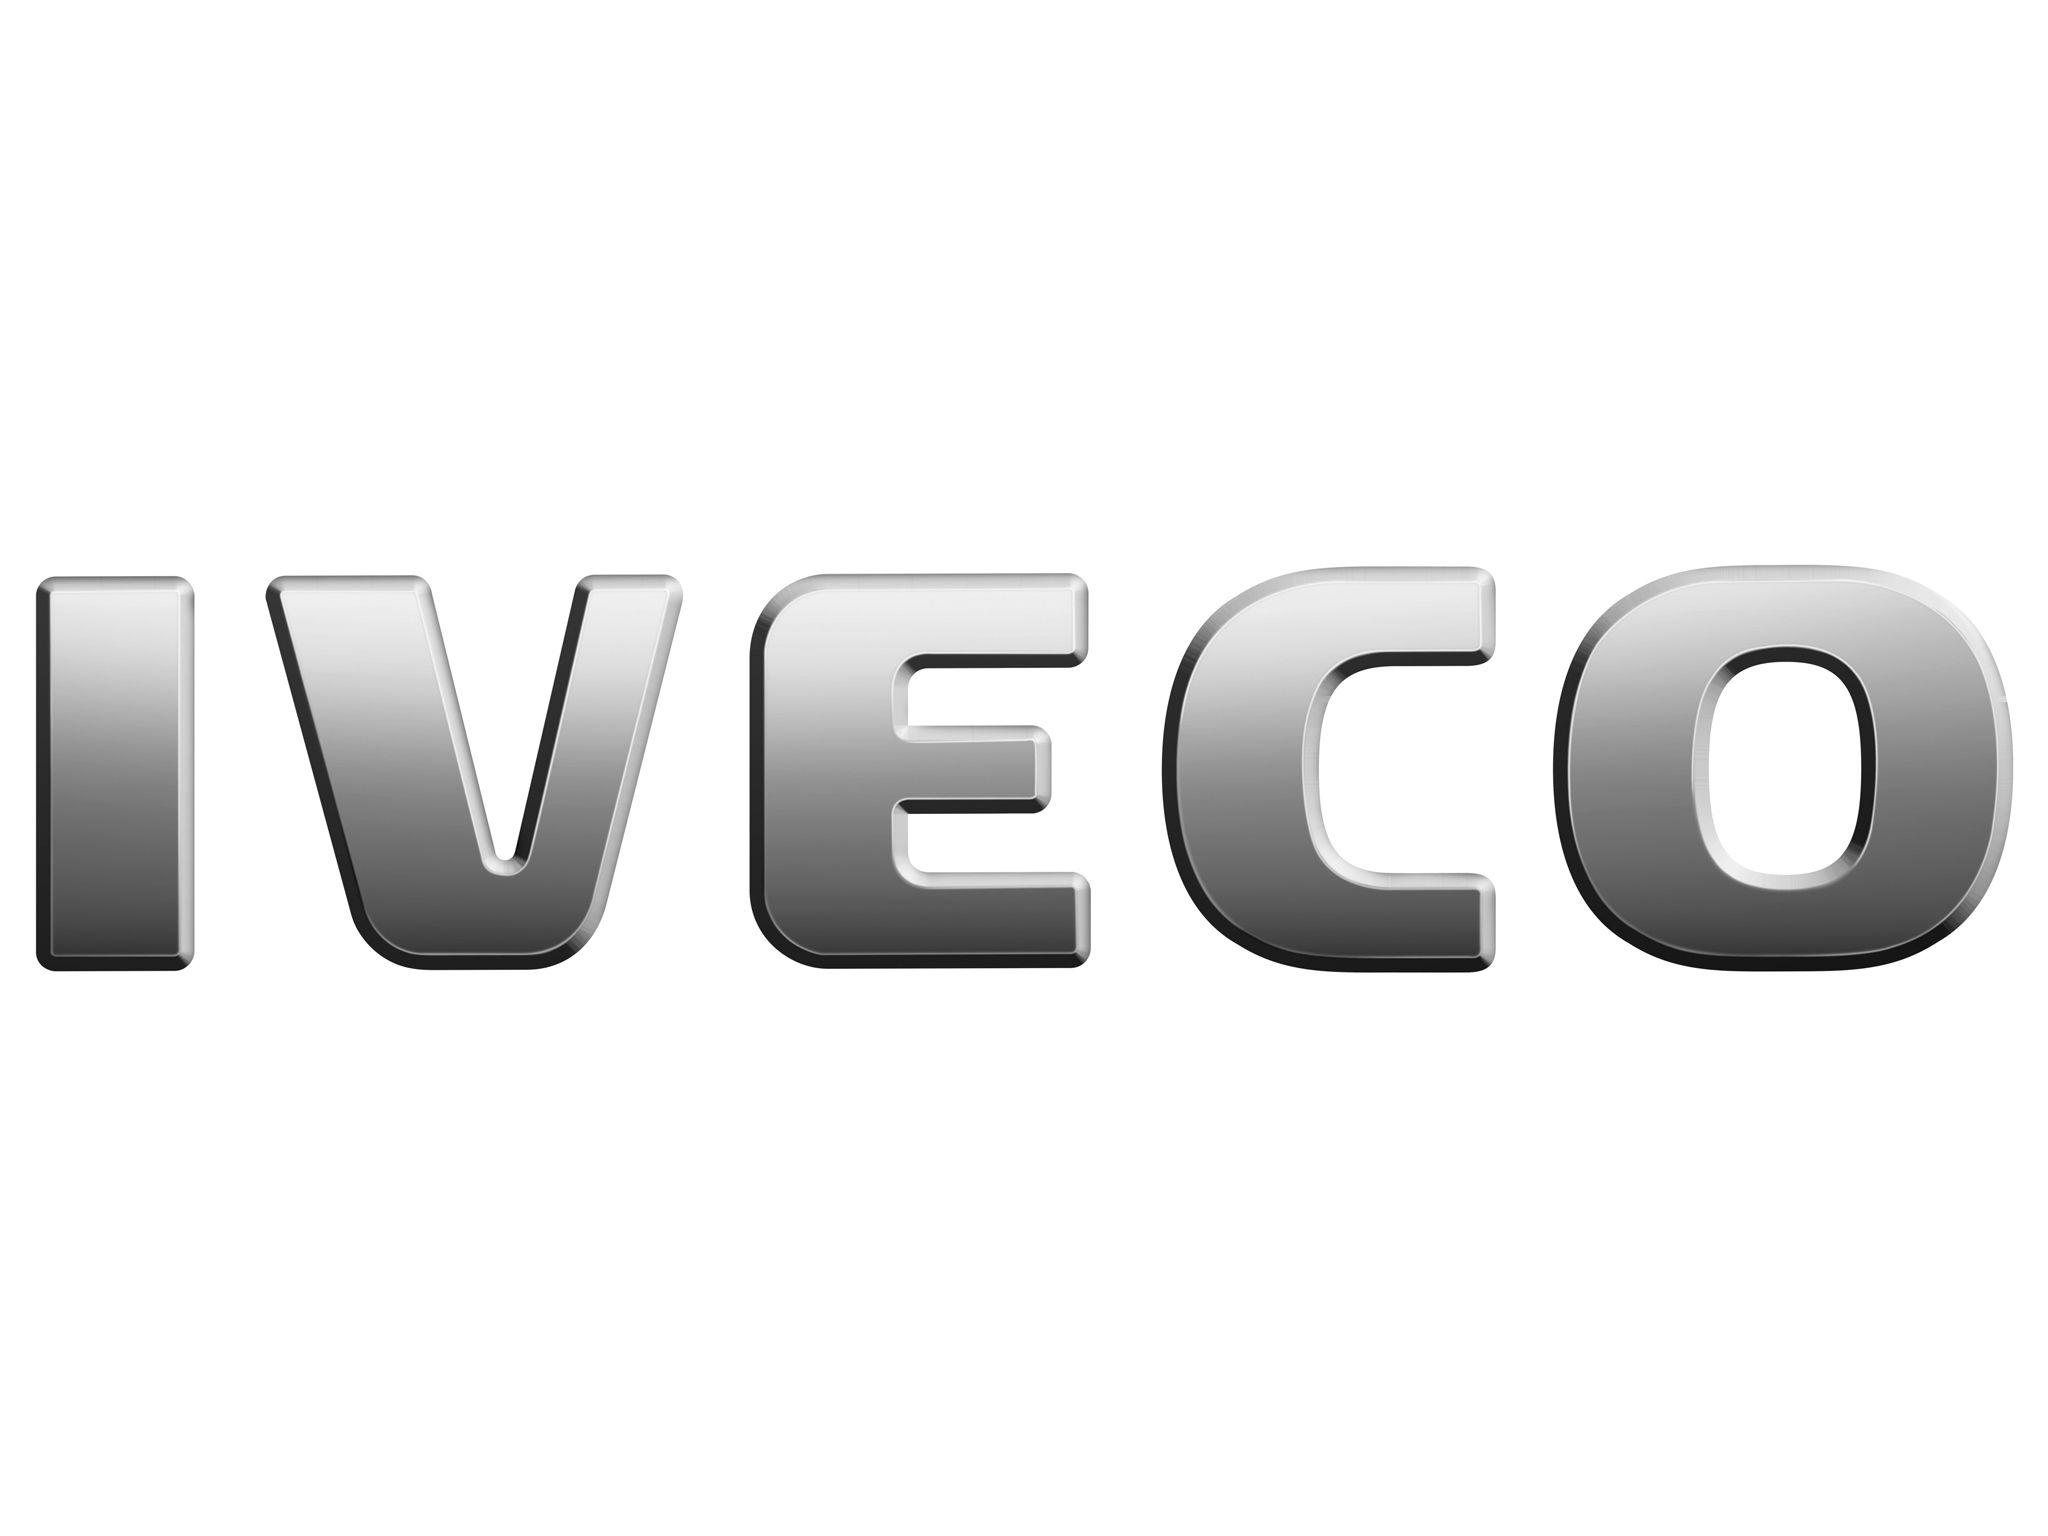 Iveco Logo Wallpaper